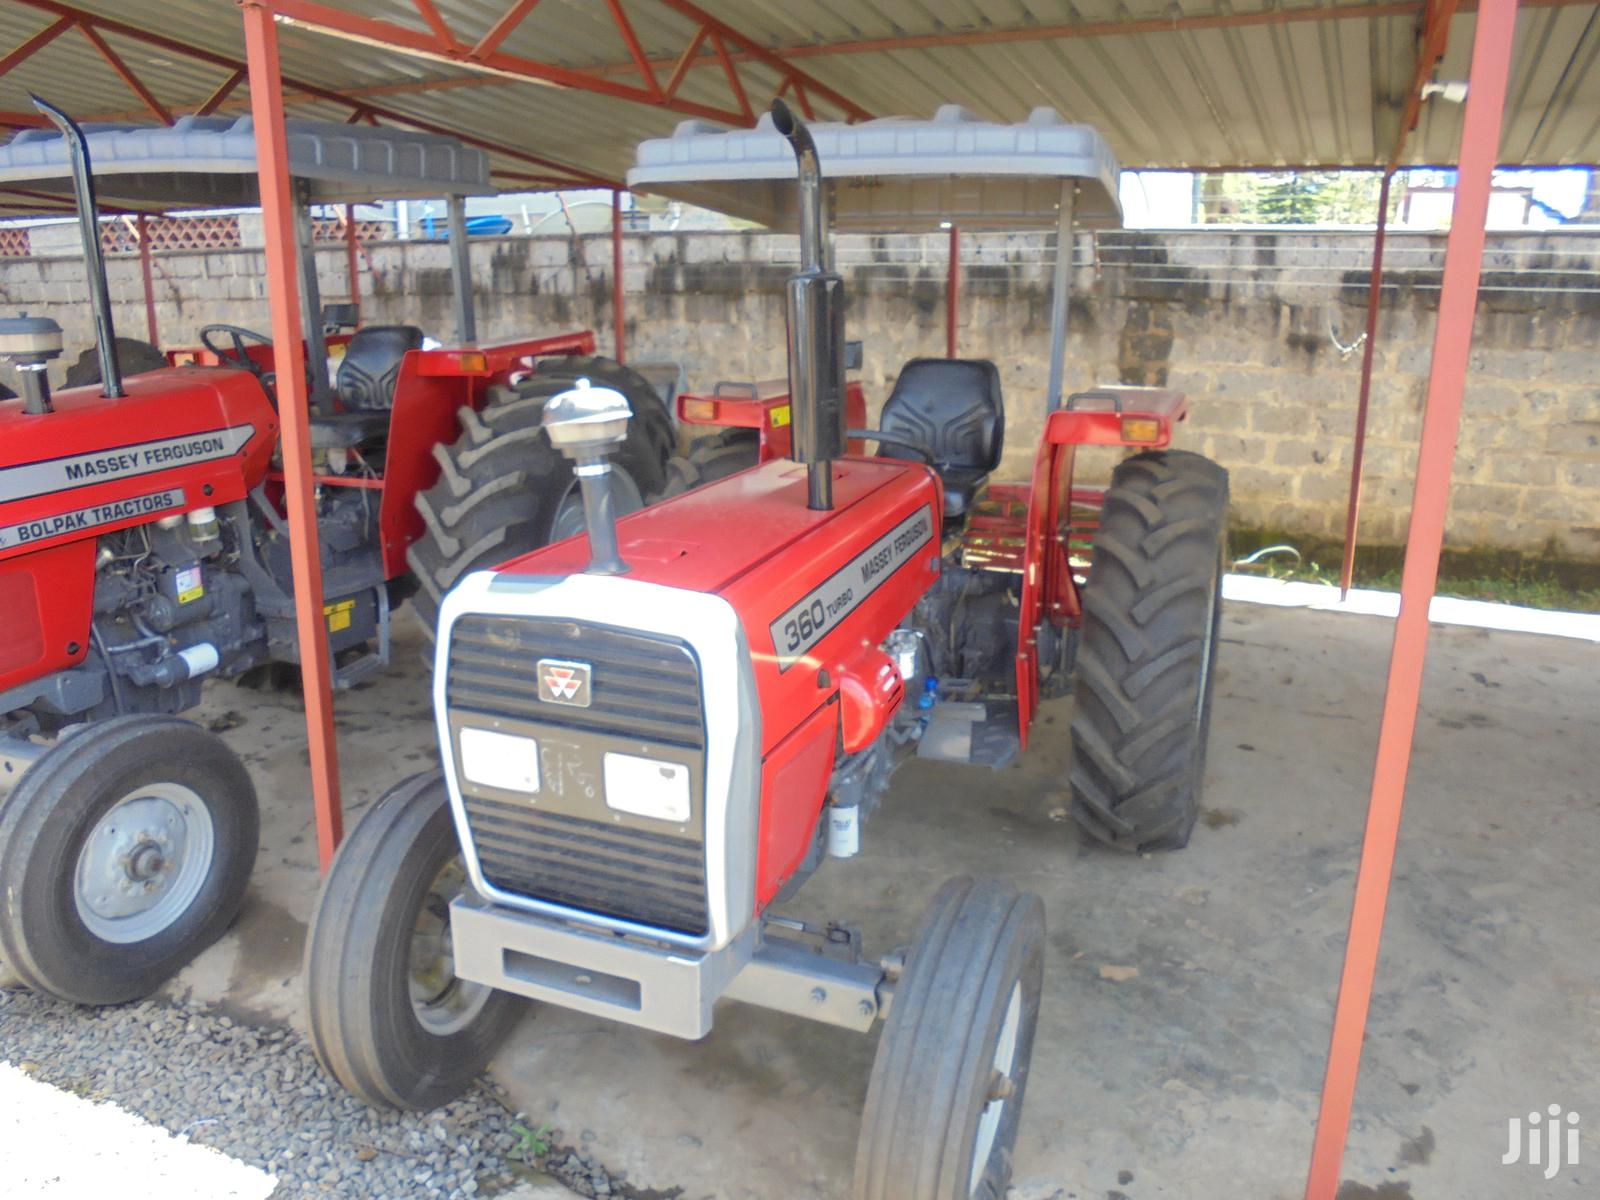 Tractor Mf 360 2wd 1.45 | Heavy Equipment for sale in Nairobi Central, Nairobi, Kenya